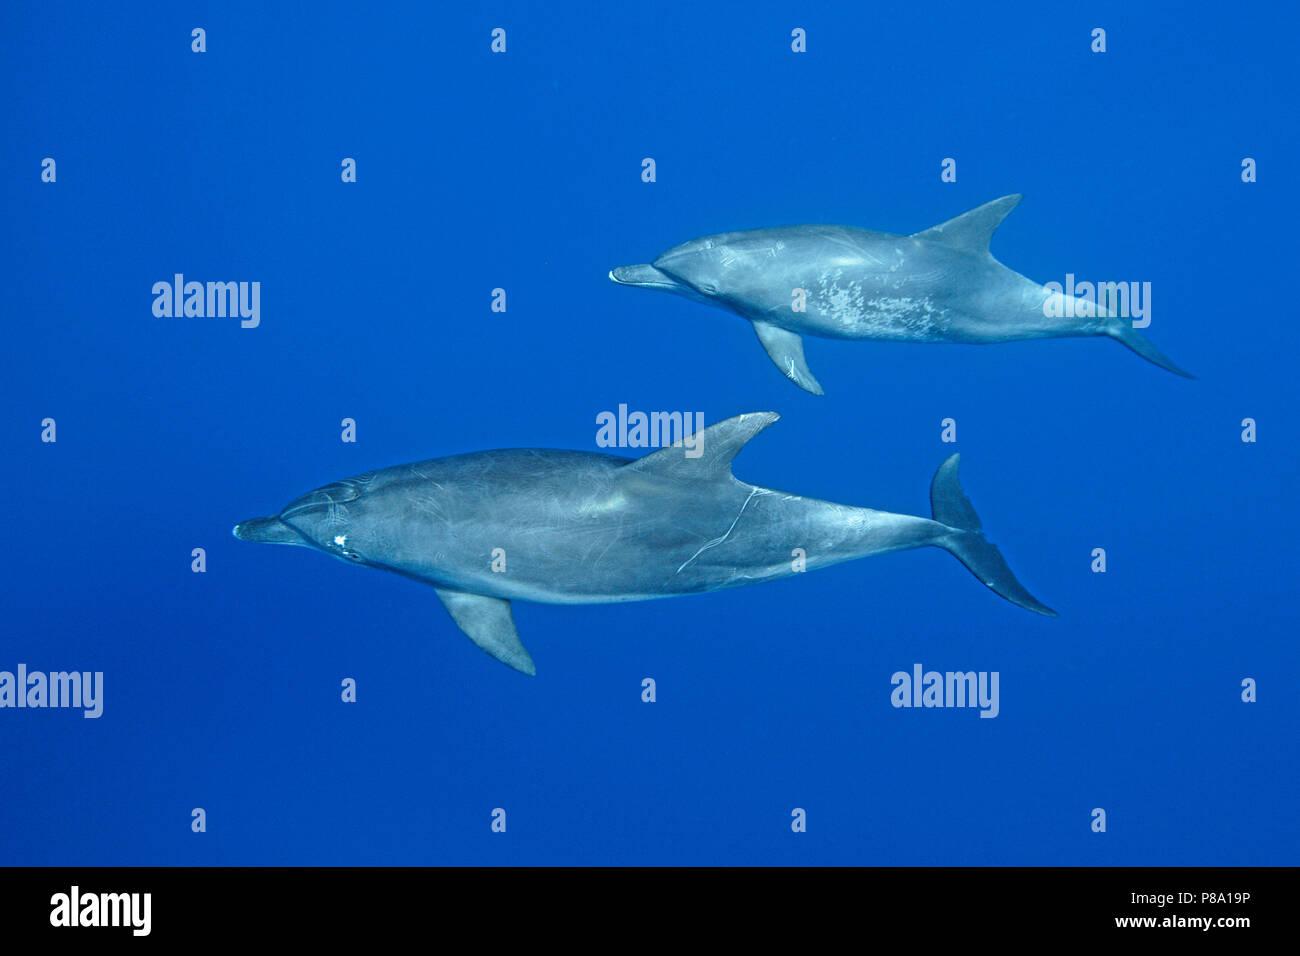 Indo-Pacific bottlenose dolphin (Tursiops aduncus), Pair, Ogasawara, Japan - Stock Image